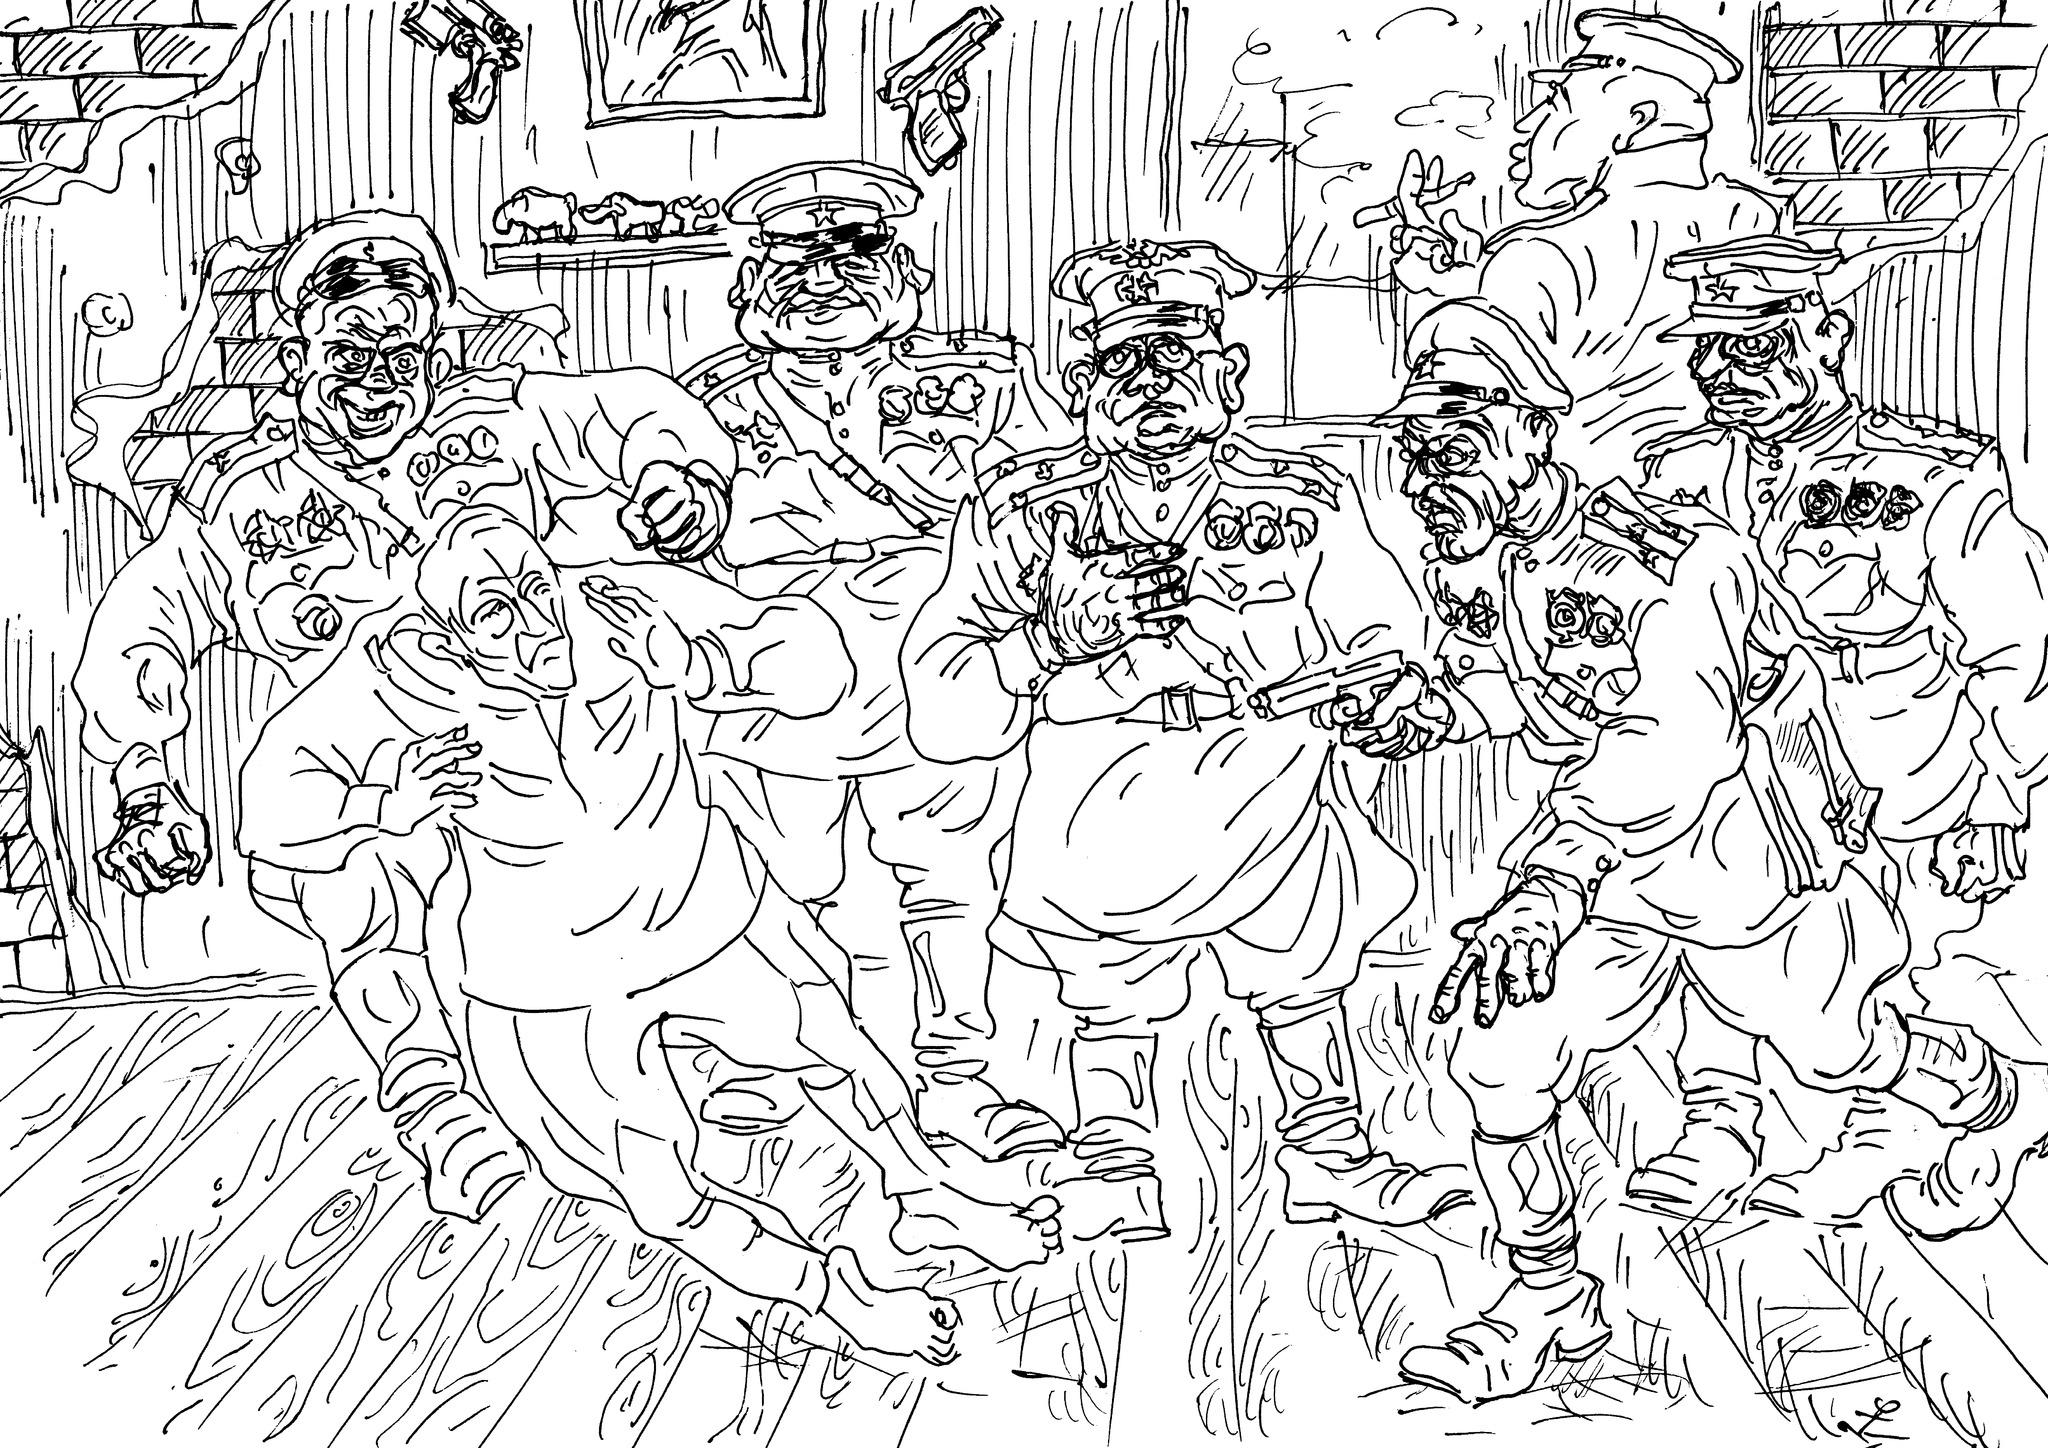 Бойцы невидимого фронта поймали на анекдотах солдатика и вербуют его